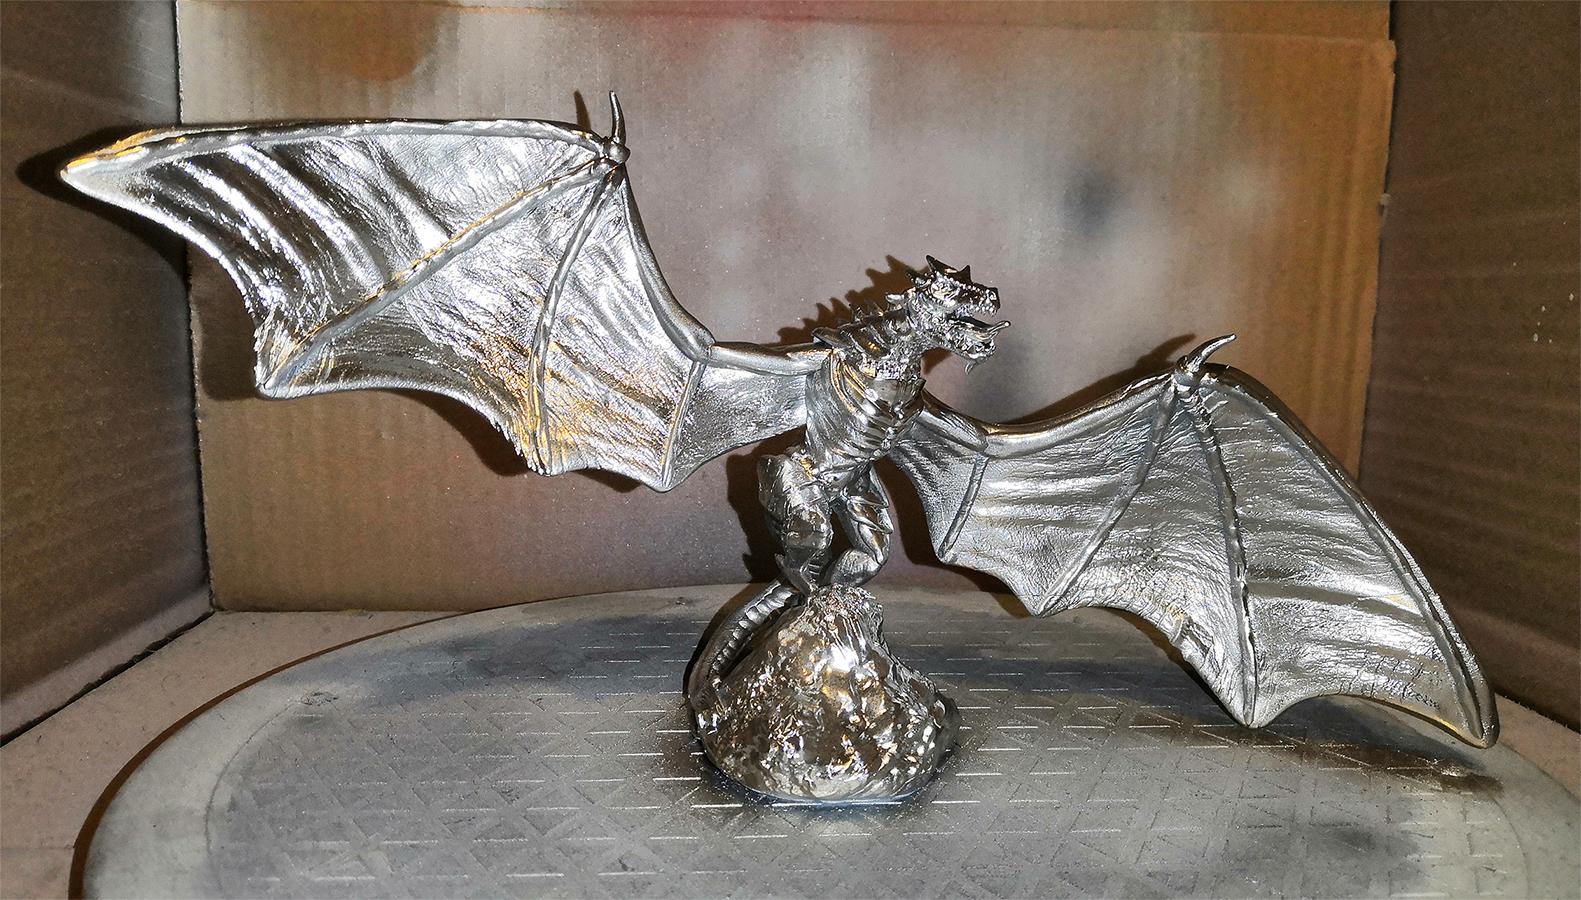 Dragon Wood Green Wyvern Boss Epic Monster 3D printed   Etsy